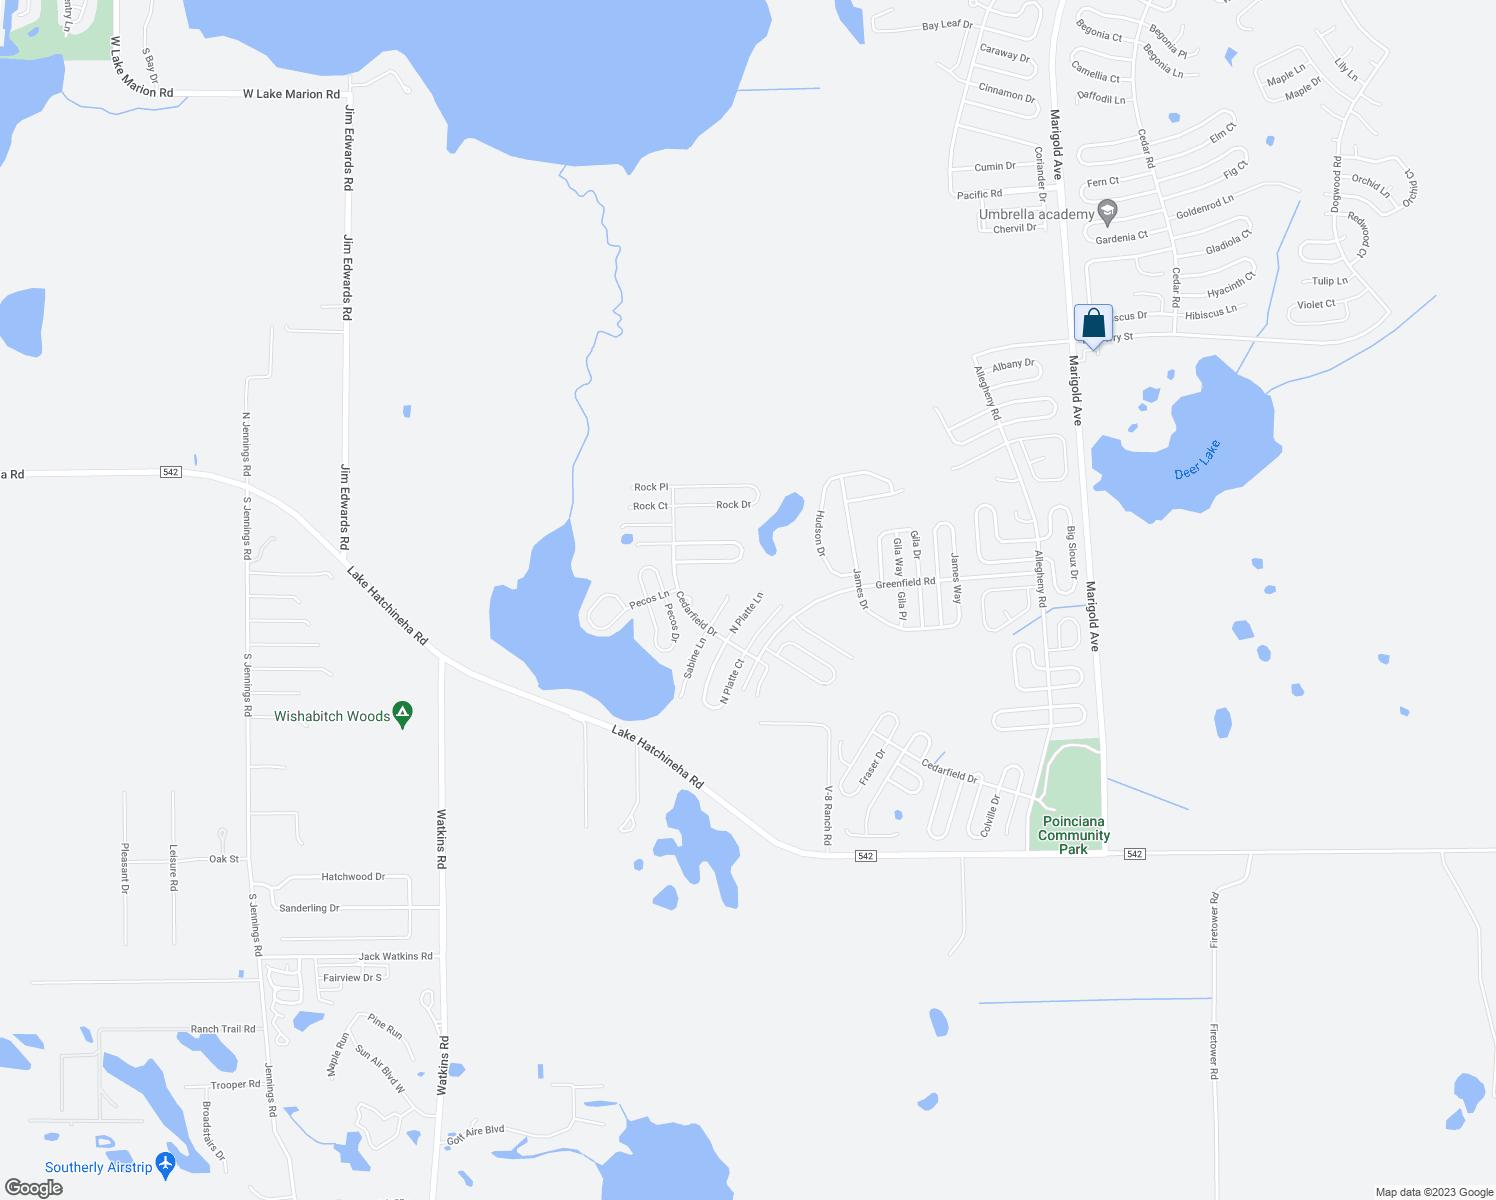 1156 North Platte Lane, Poinciana FL - Walk Score